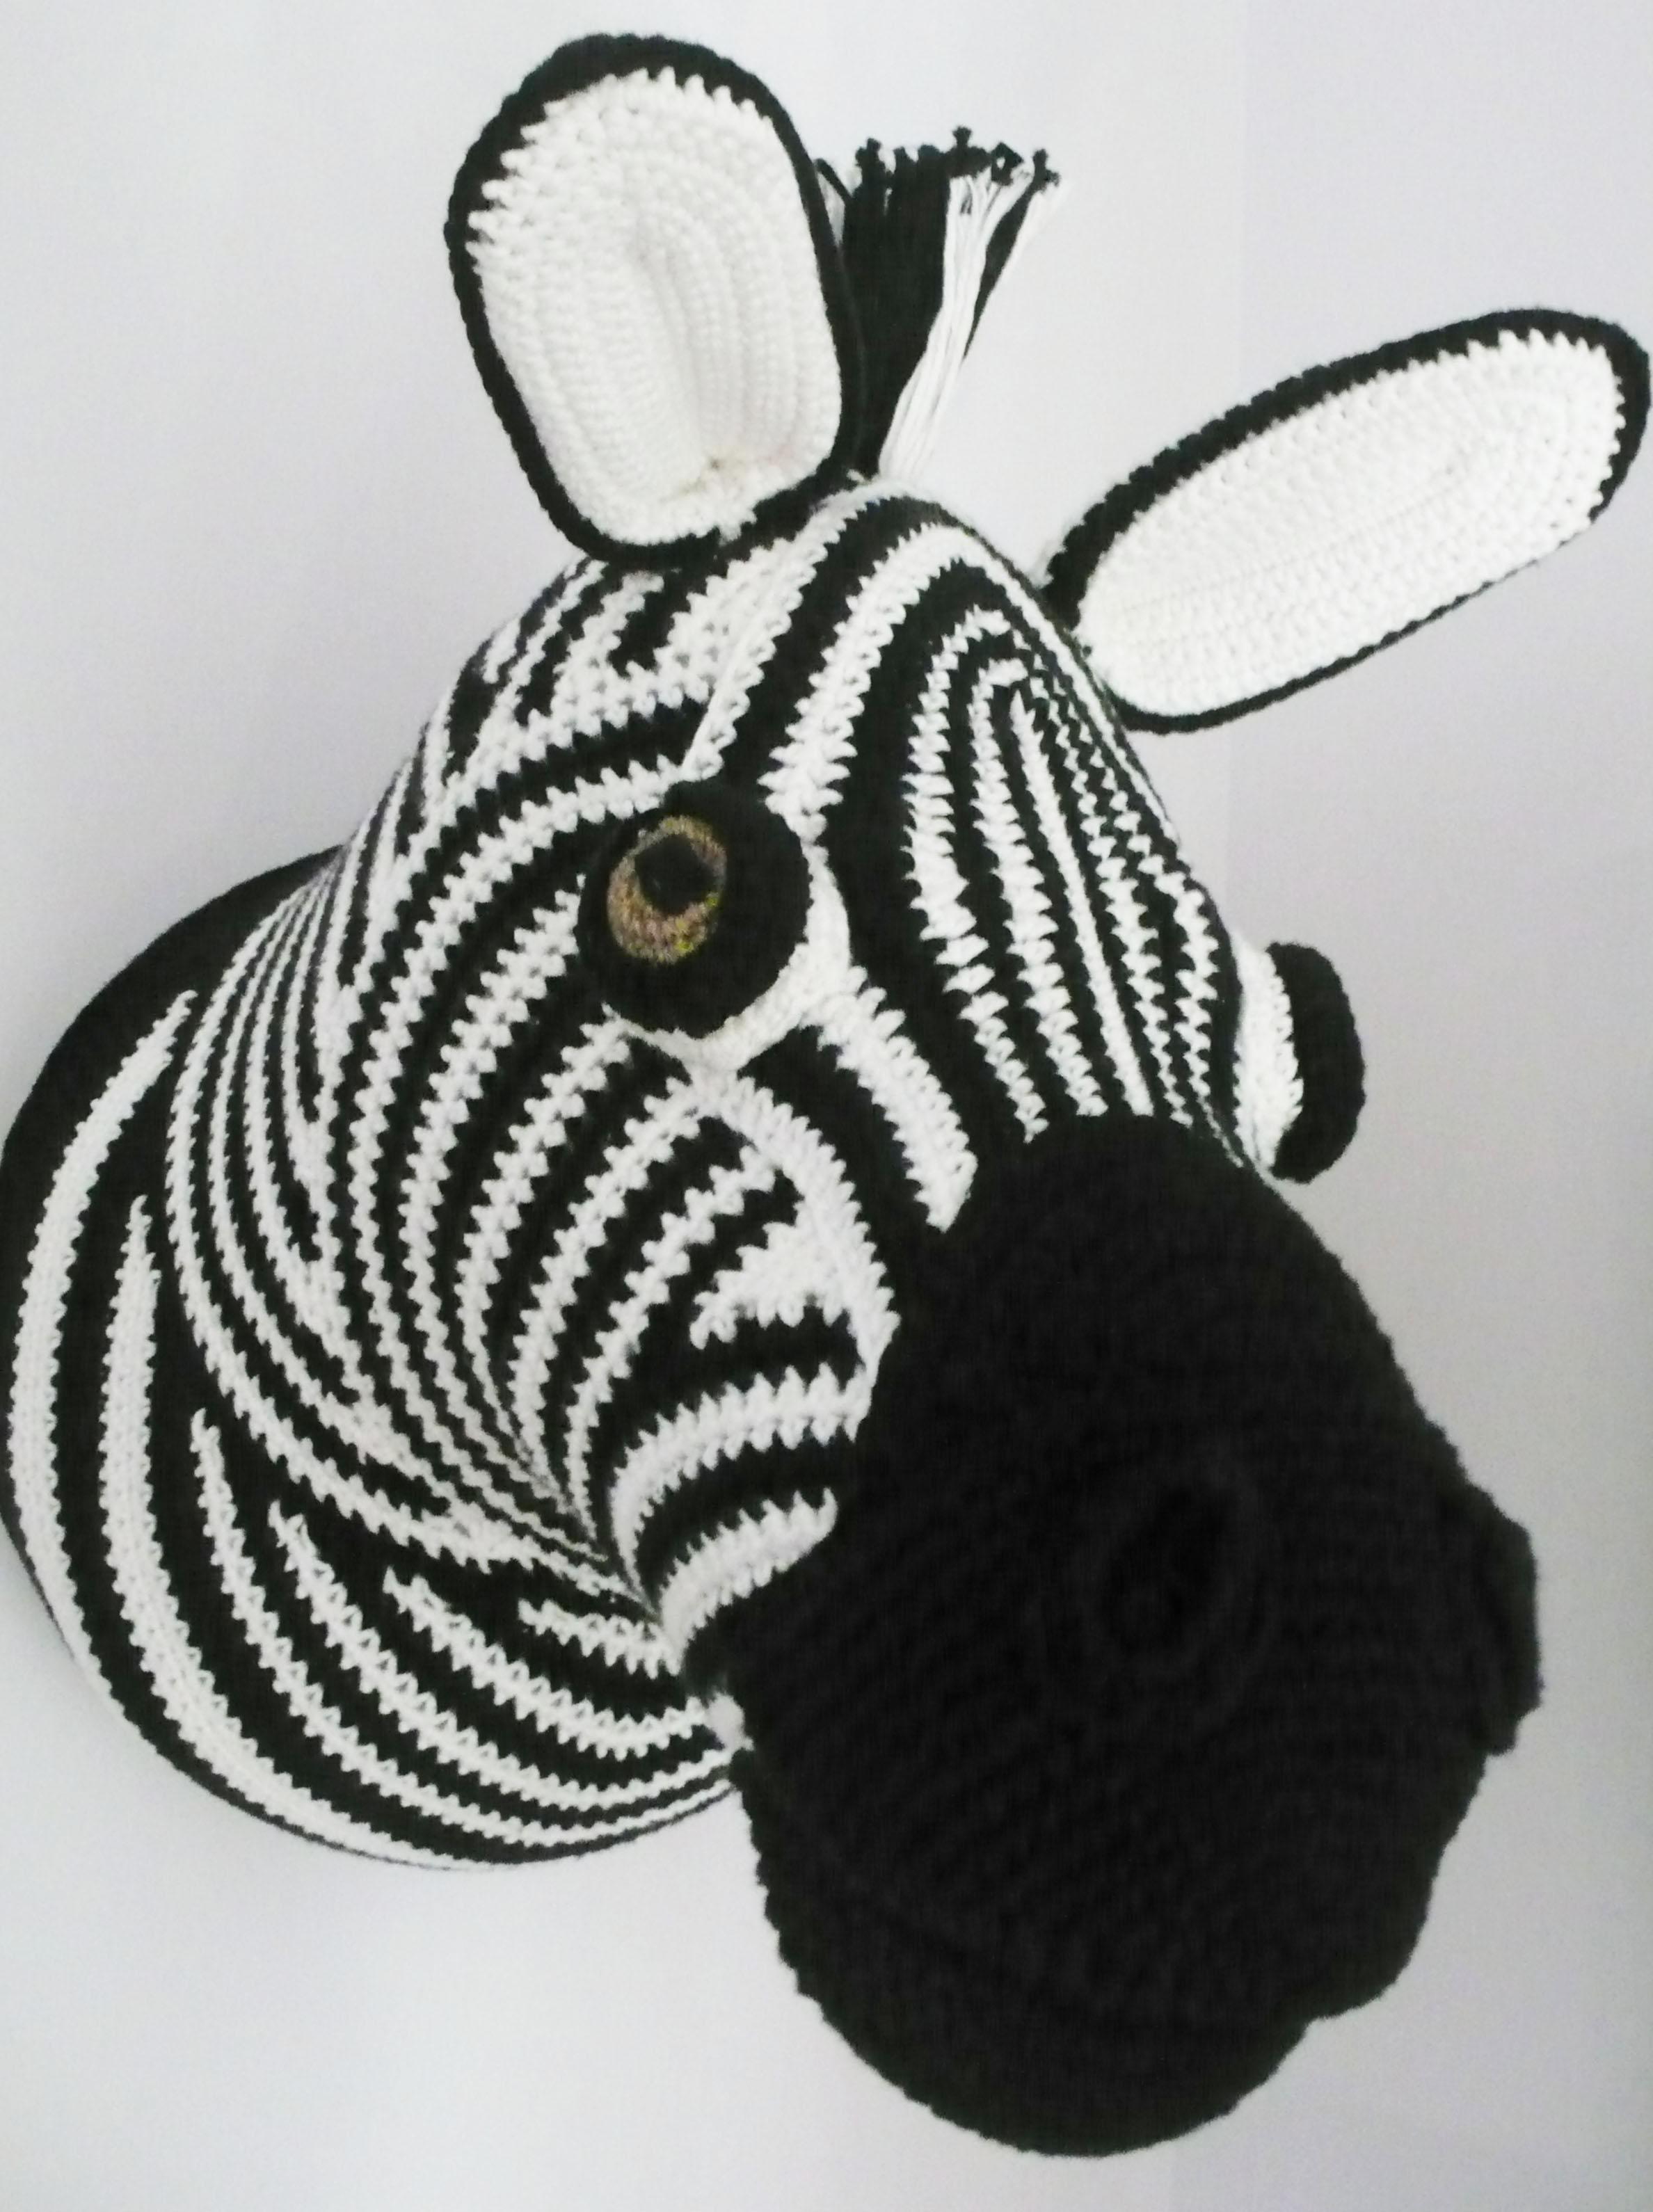 The knitting fox